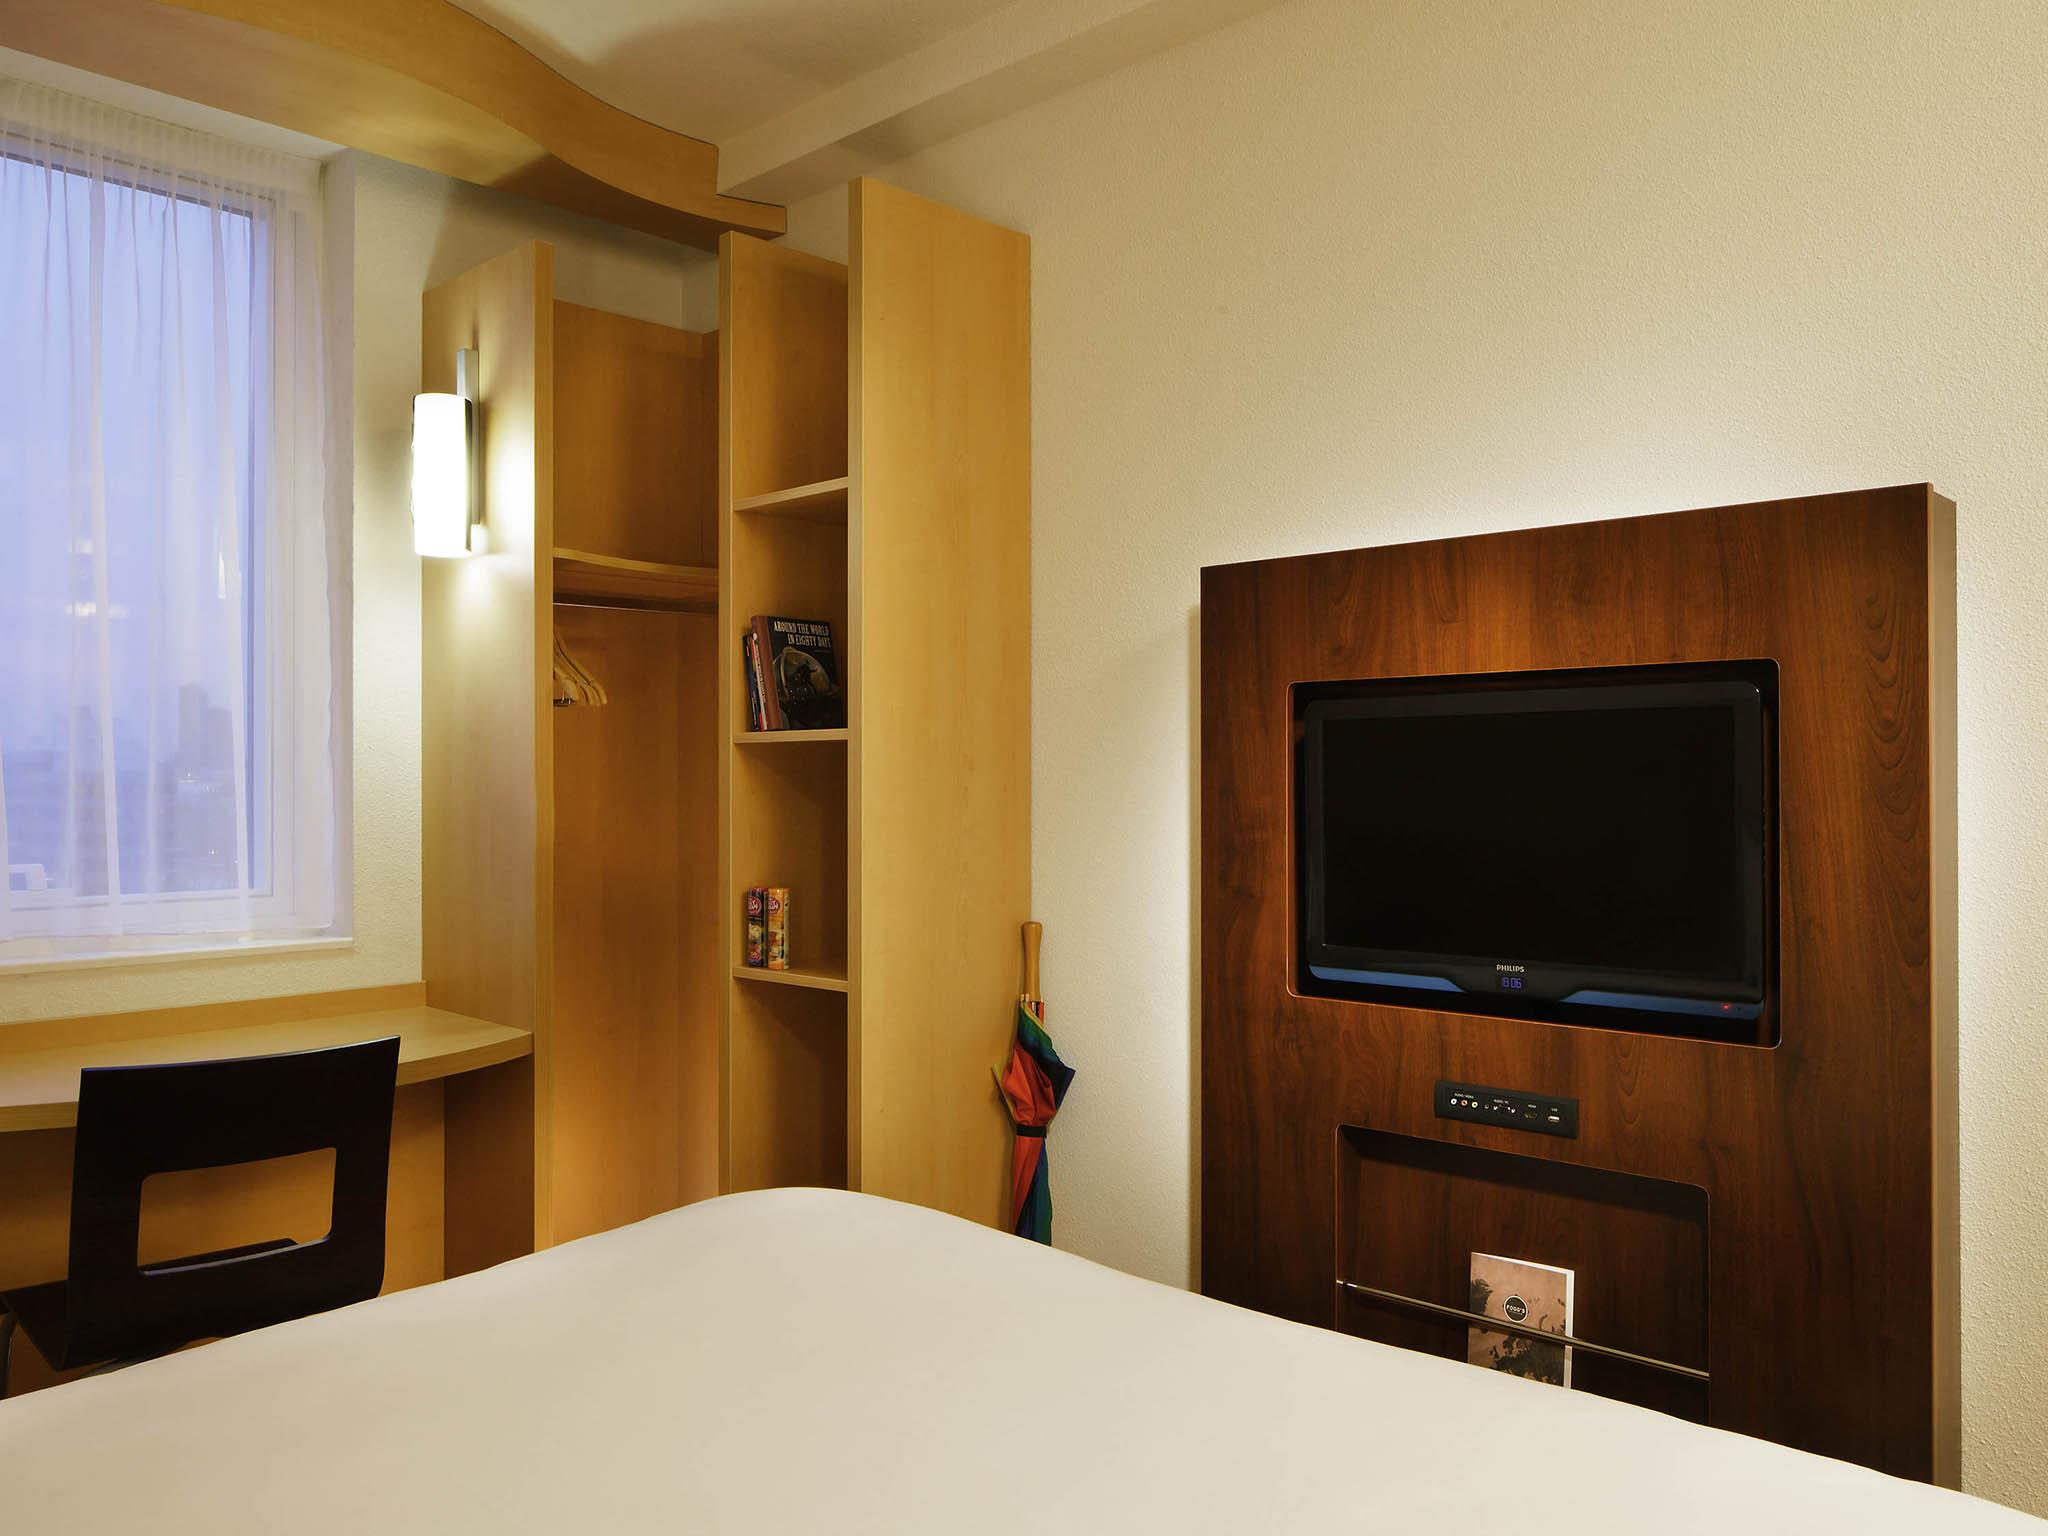 ibis London Blackfriars | Cheap Hotels in London